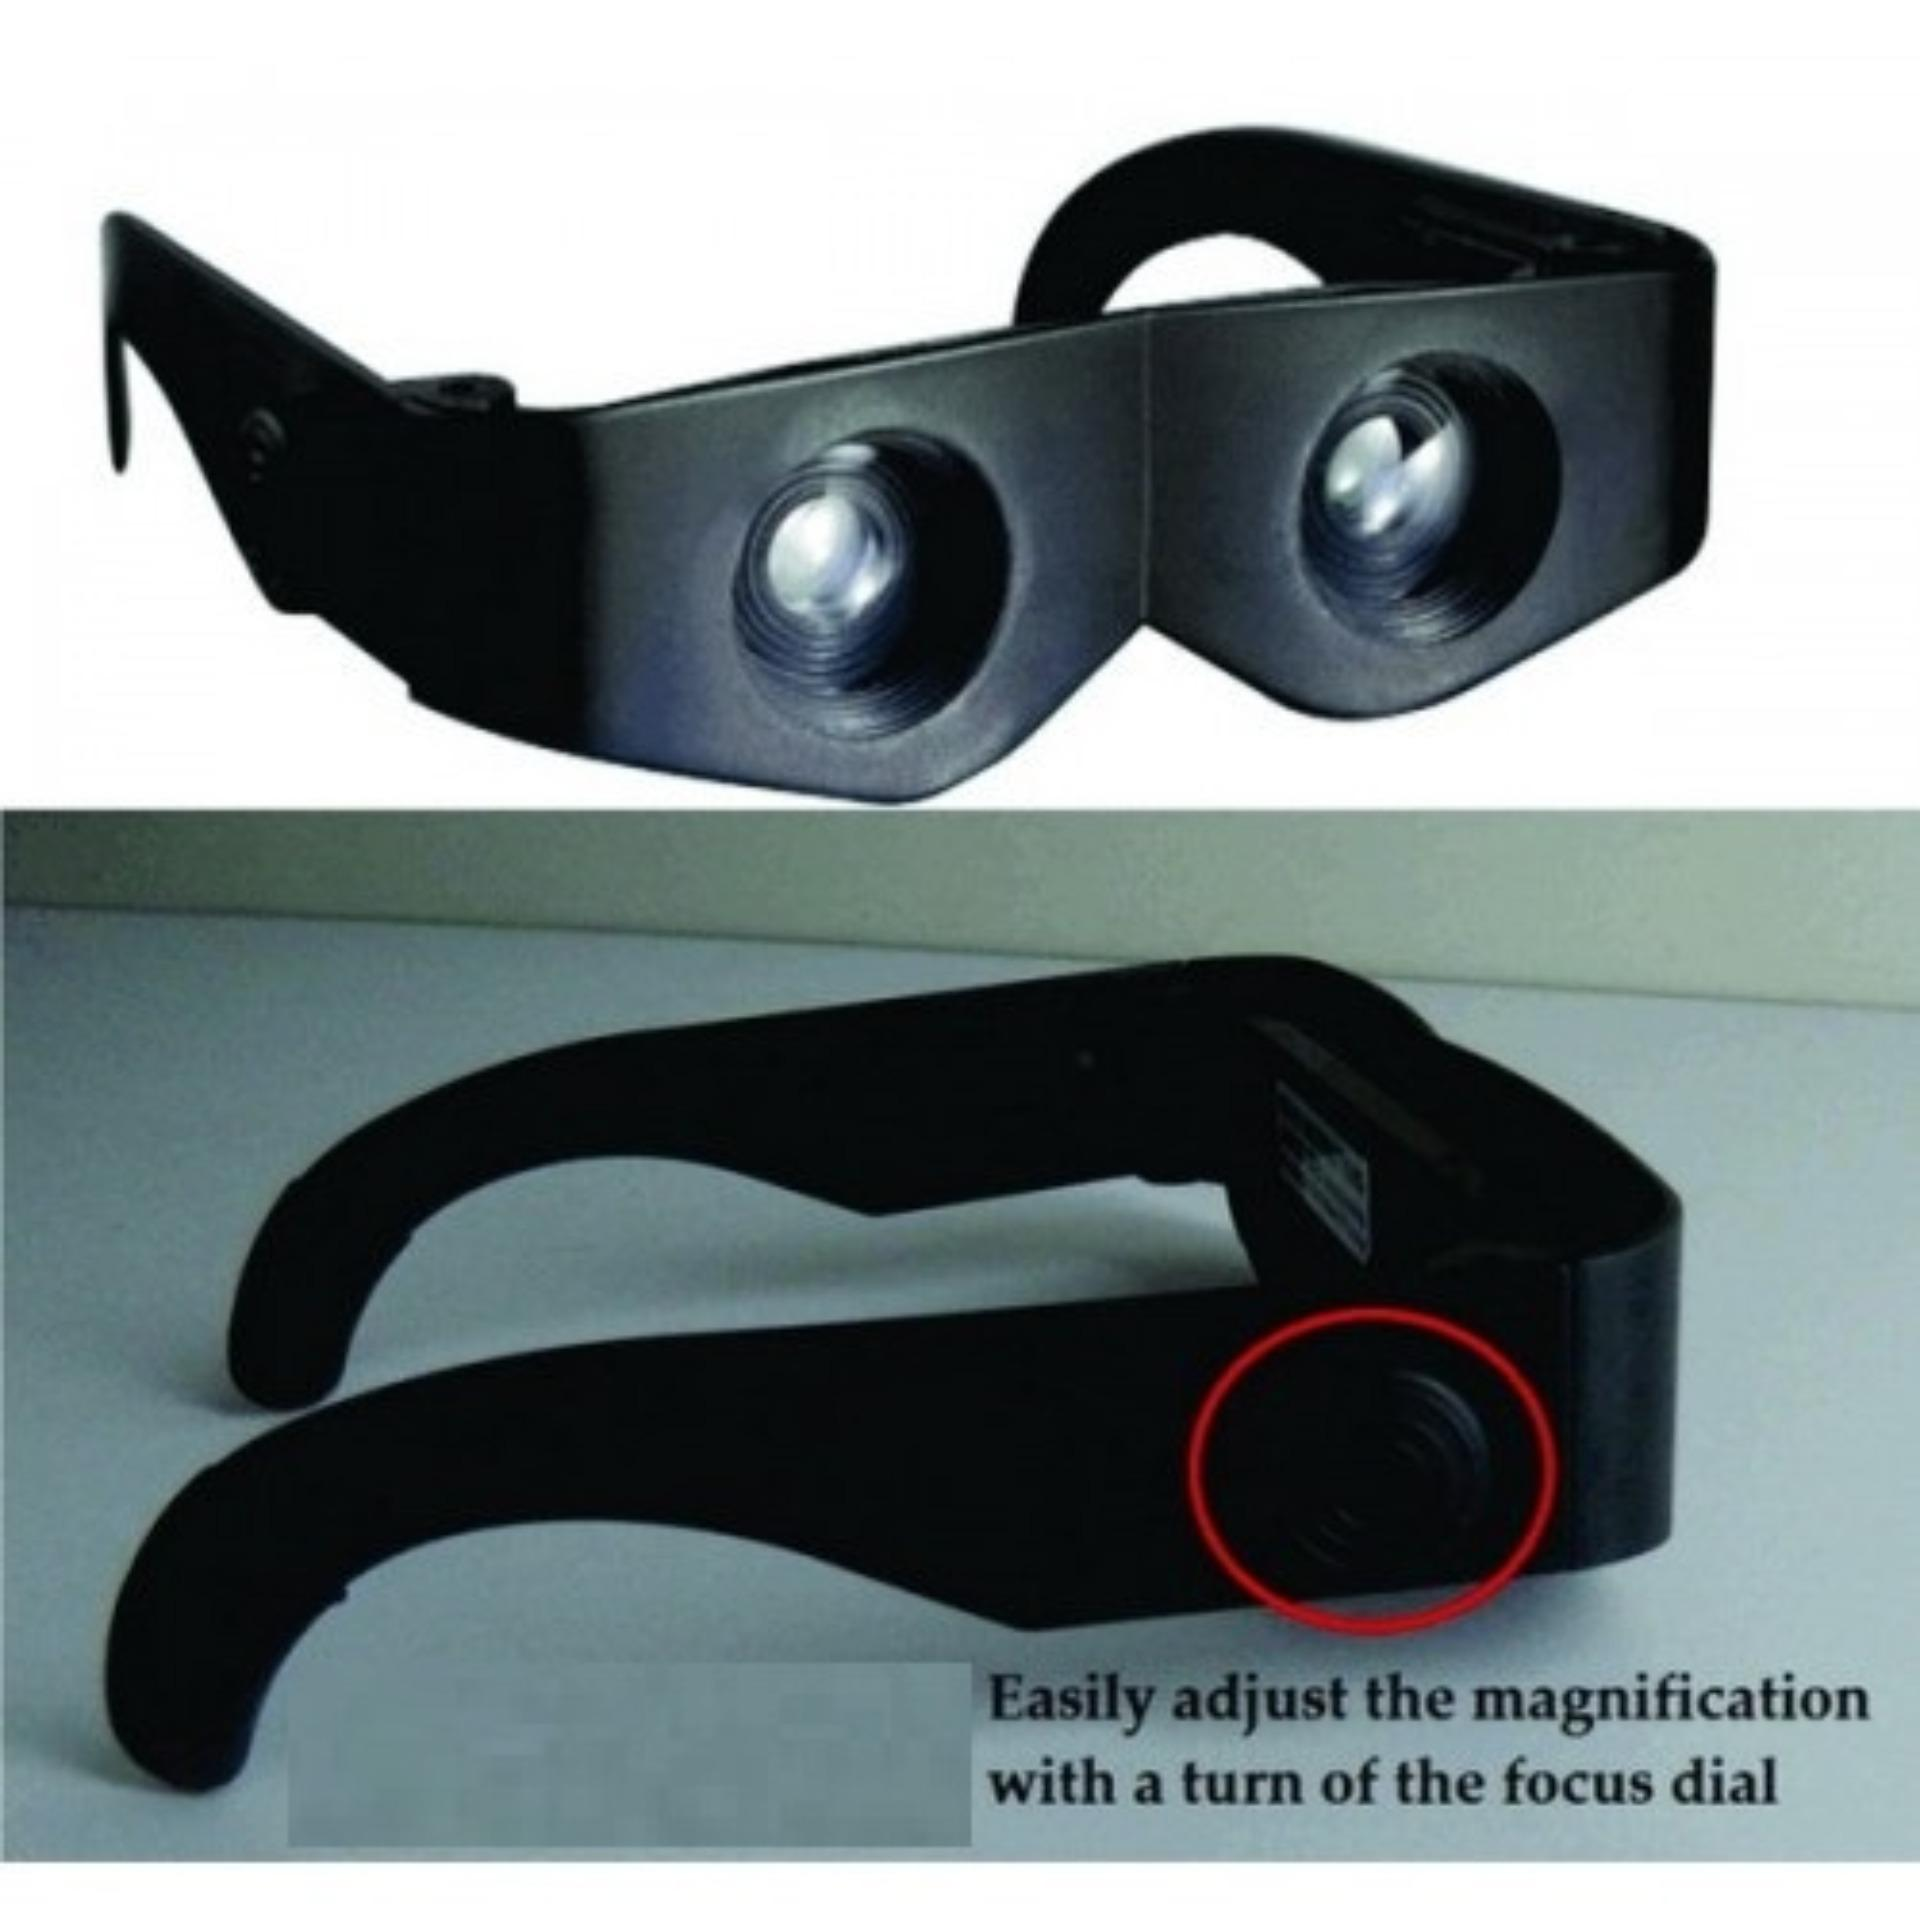 Kacamata Teropong Untuk Melihat Jarak Jauh / Kacamata Zoom Untuk Nonton Bola Di Stadion Maupun Konser